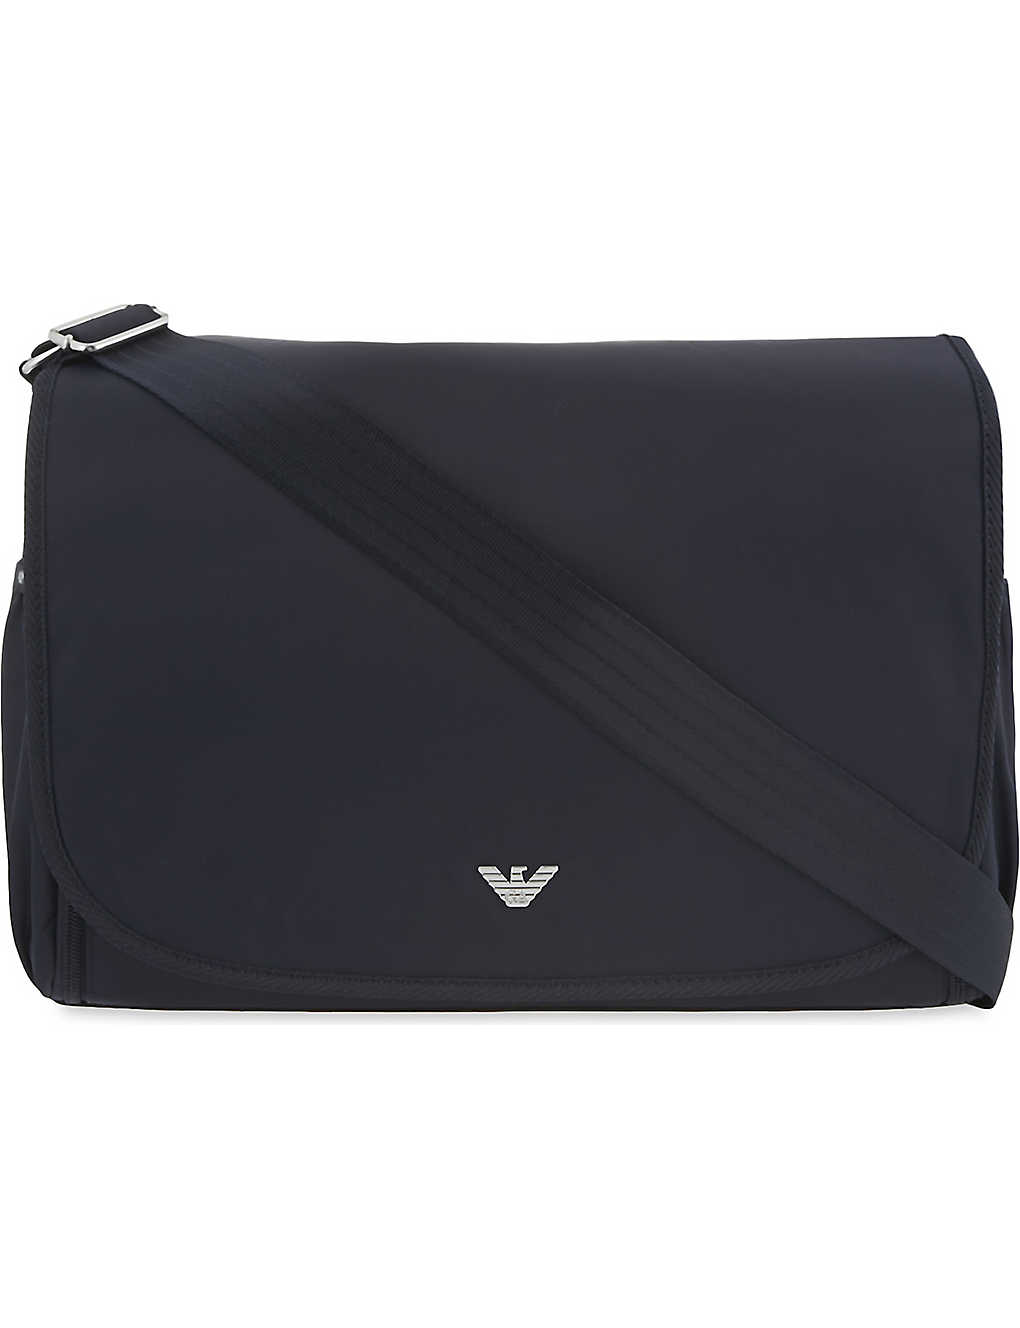 bf4c5f75c36 EMPORIO ARMANI - Changing bag